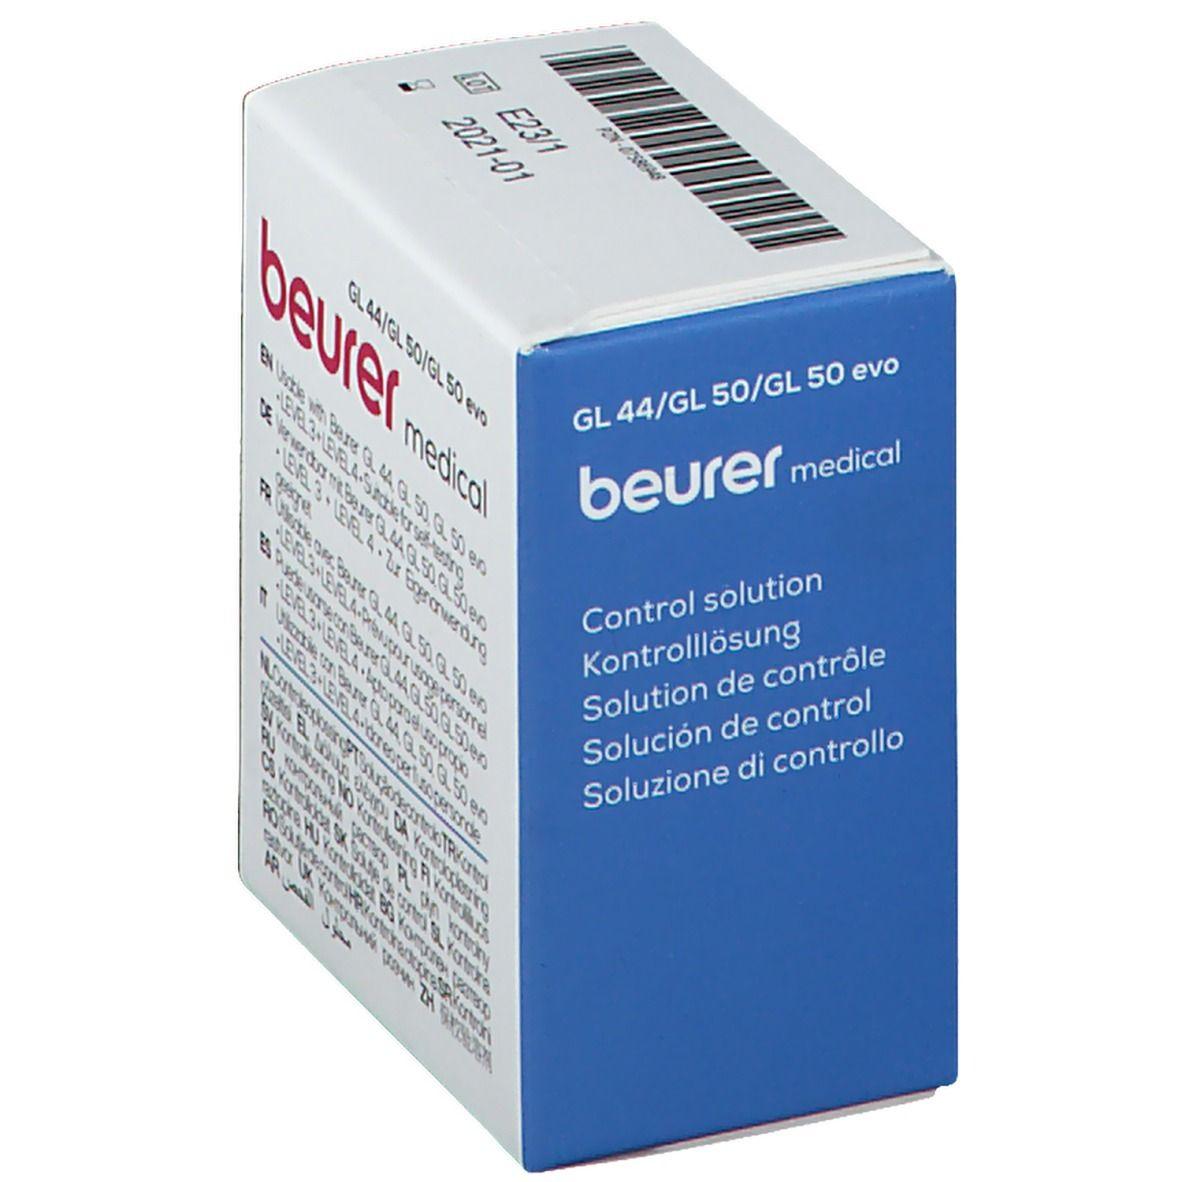 beurer Kontrolllösung Level 4 GL44/GL50